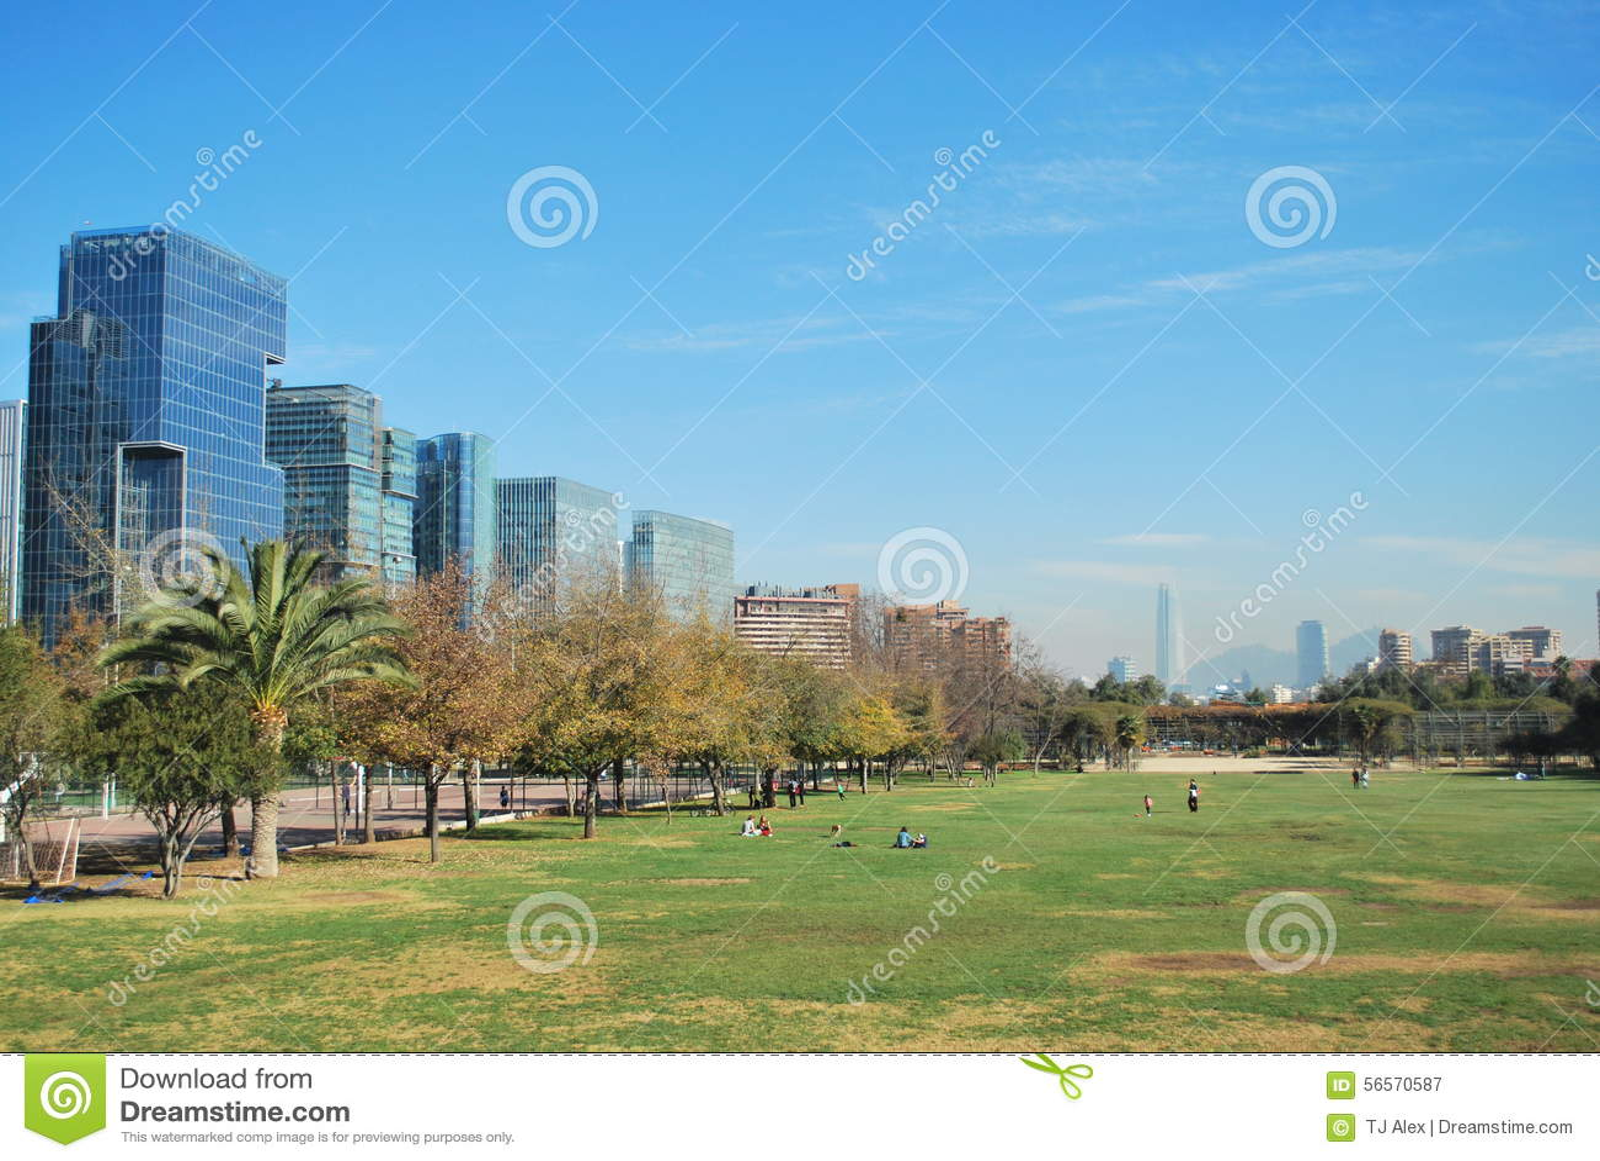 Download Πόλη του Σαντιάγο στη Χιλή στοκ εικόνα. εικόνα από δρόμοι - 56570587